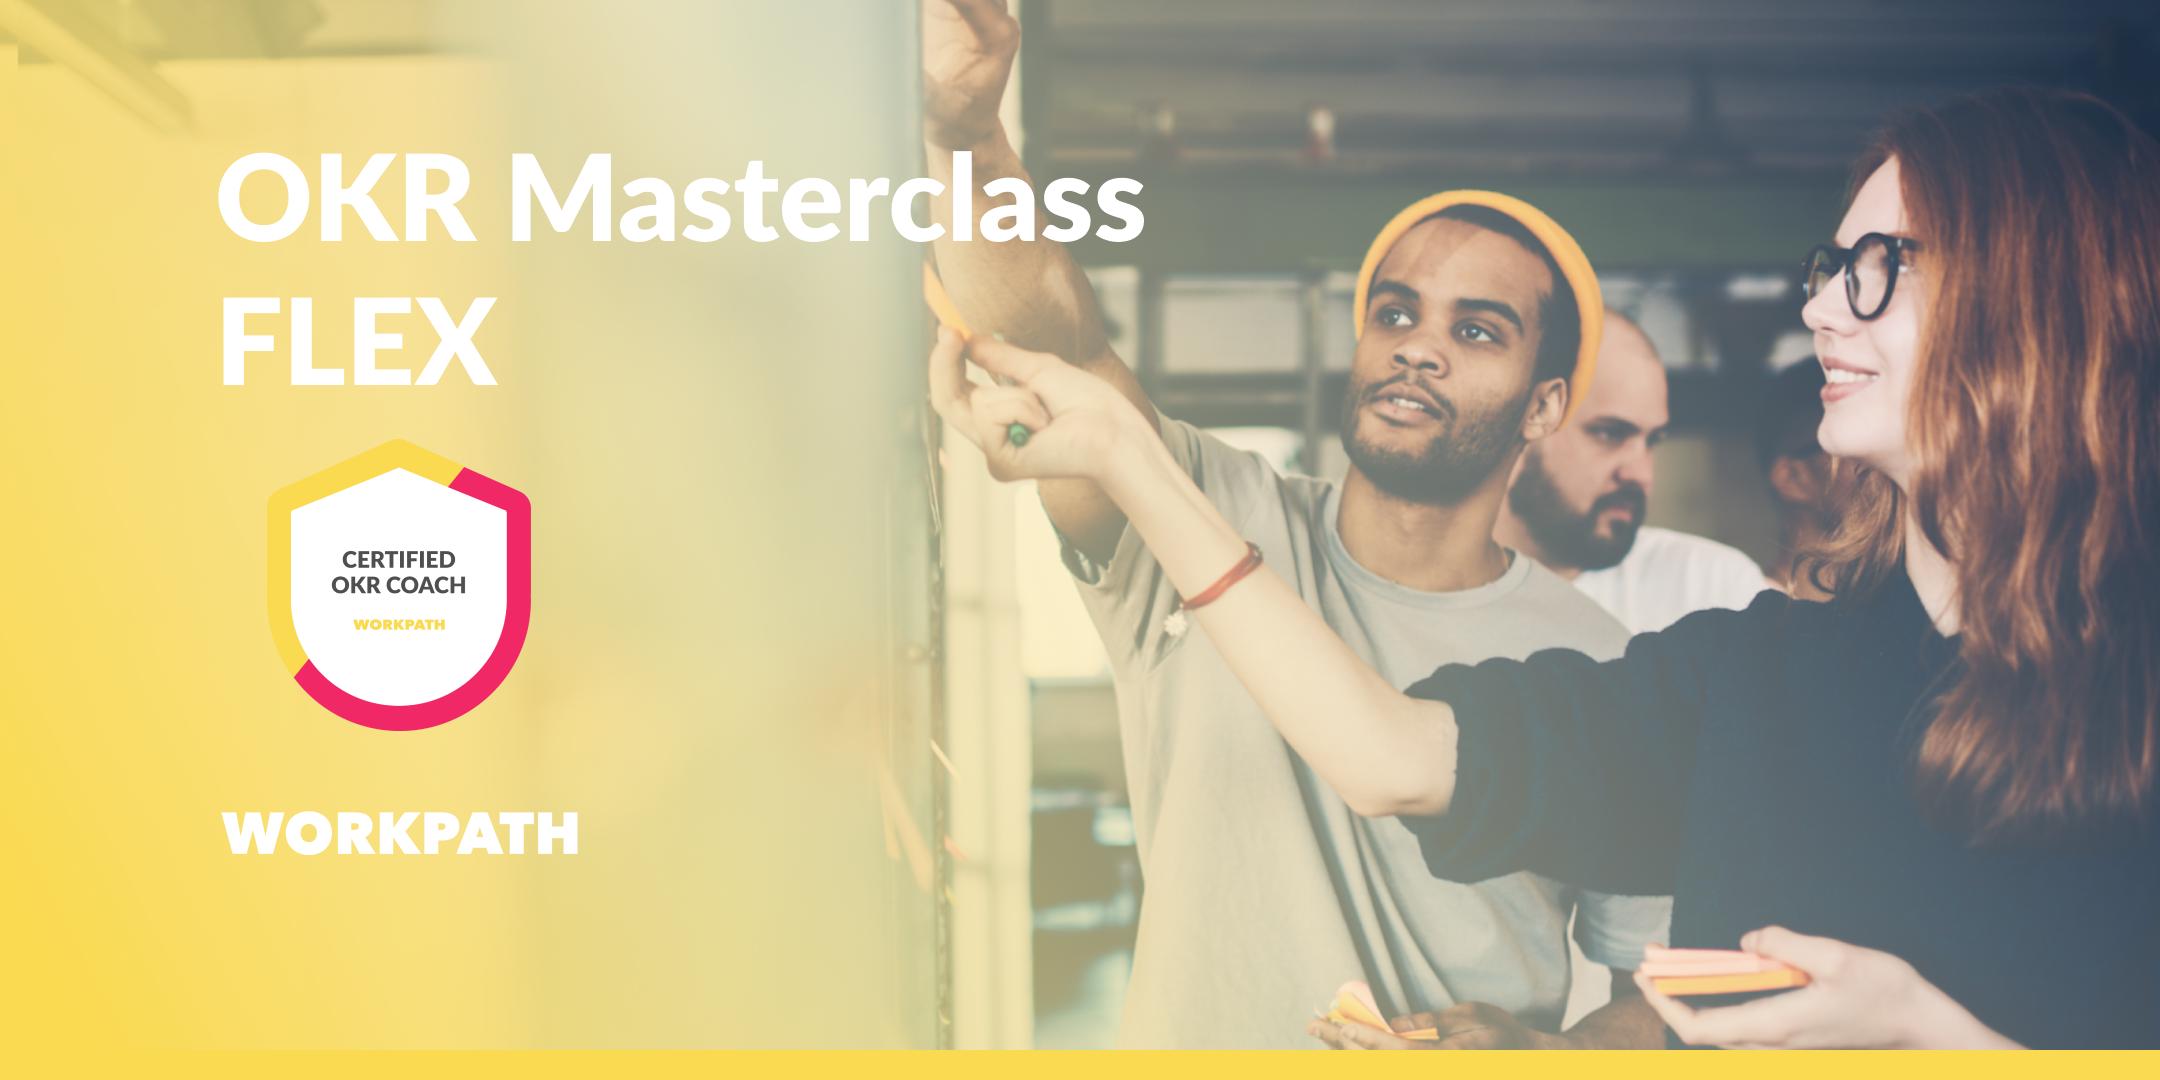 Workpath OKR Masterclass FLEX - 14+15.10  ENG  (selfstudy + 2x4h Training)